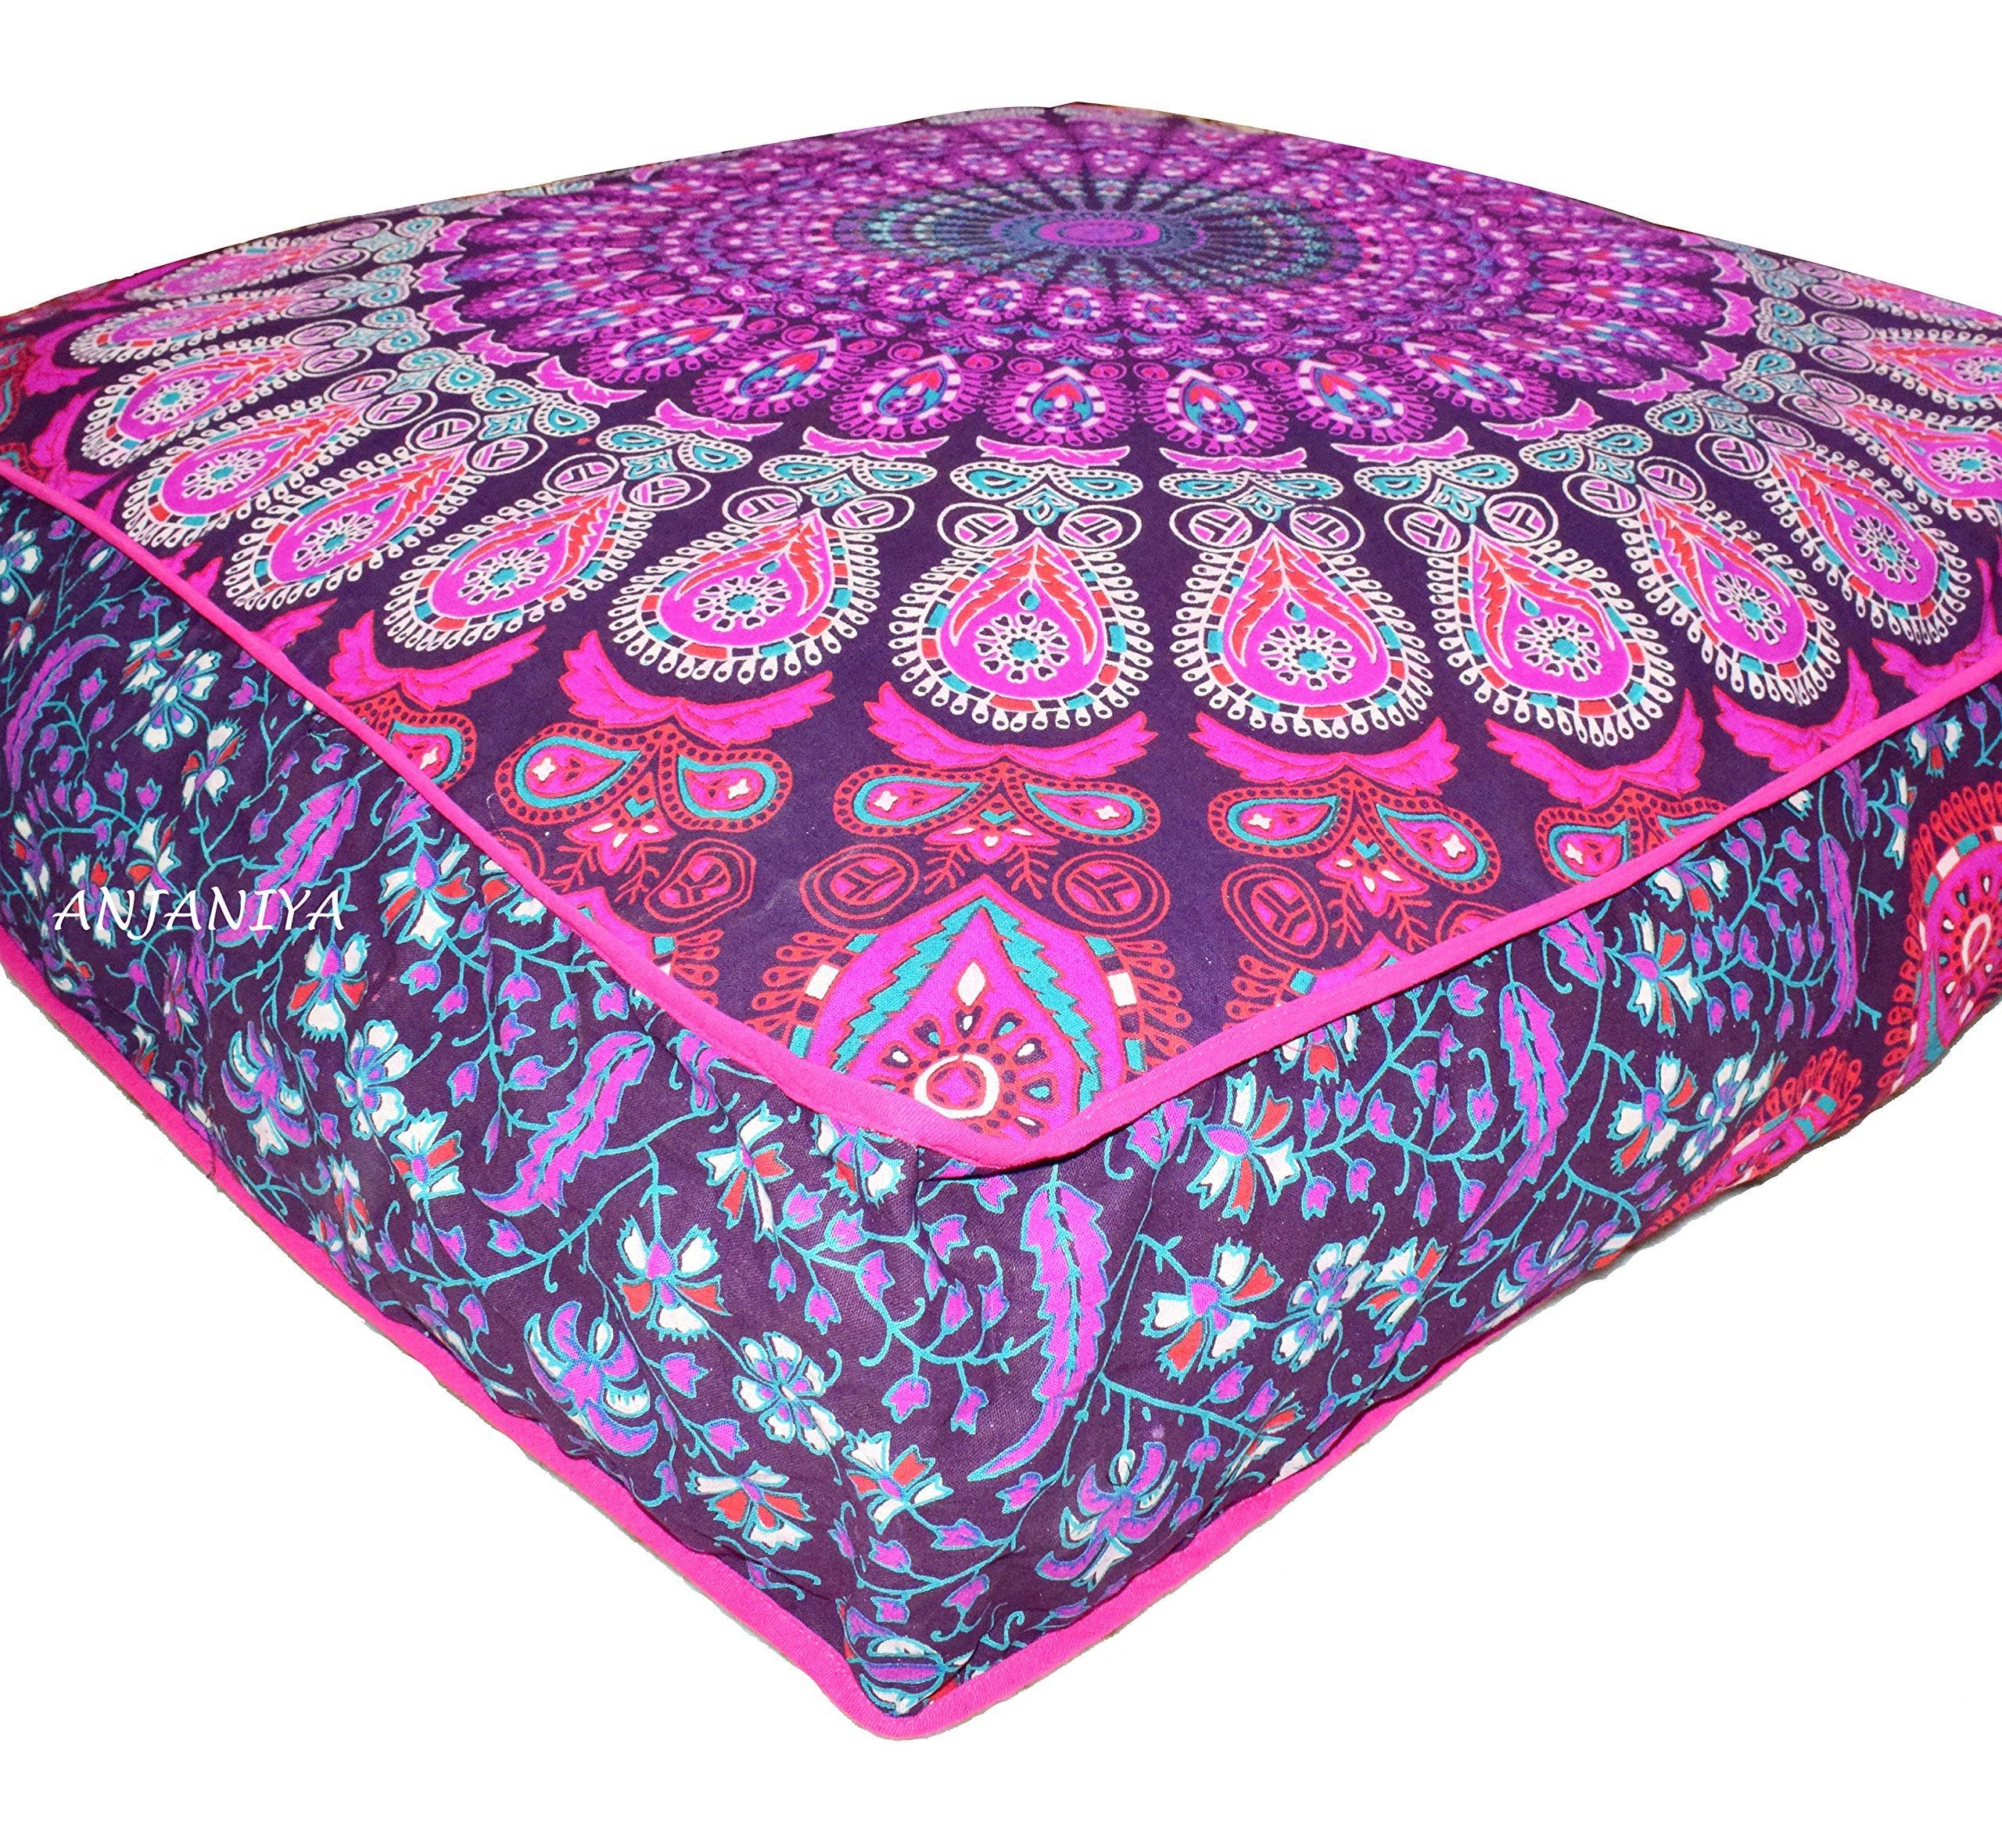 ANJANIYA 35''x35'' Mandala Bohemian Yoga Meditation Large Square Dog Bed Outdoor Floor Pillow Cover Couch Seating Cushion Throw Hippie Decorative Boho Indian Ottoman (Pink)